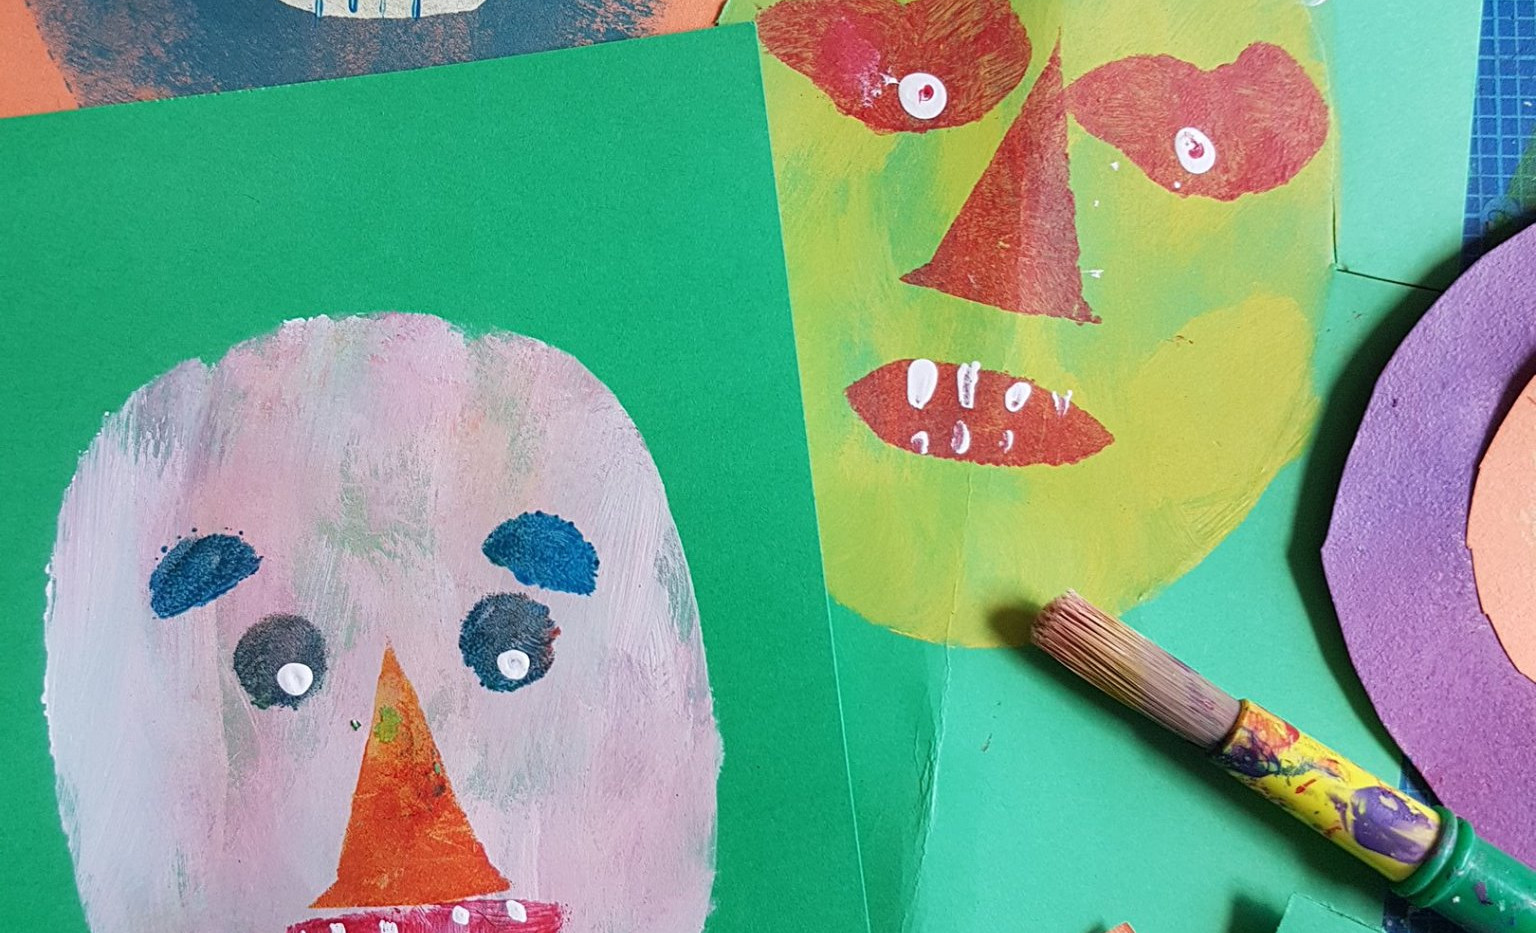 Art made by participants. Art made by participants.